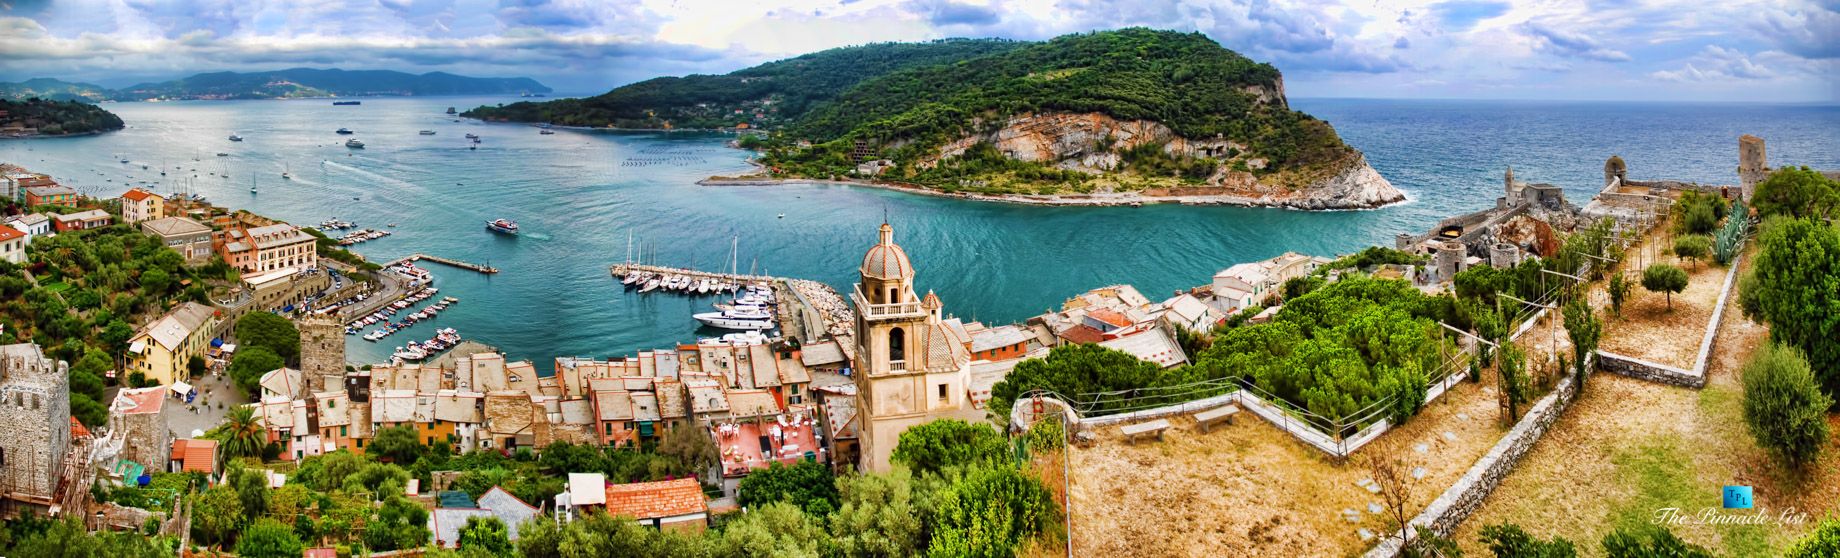 Pano – Portovenere, La Spezia, Liguria – Italy's Hidden Treasure